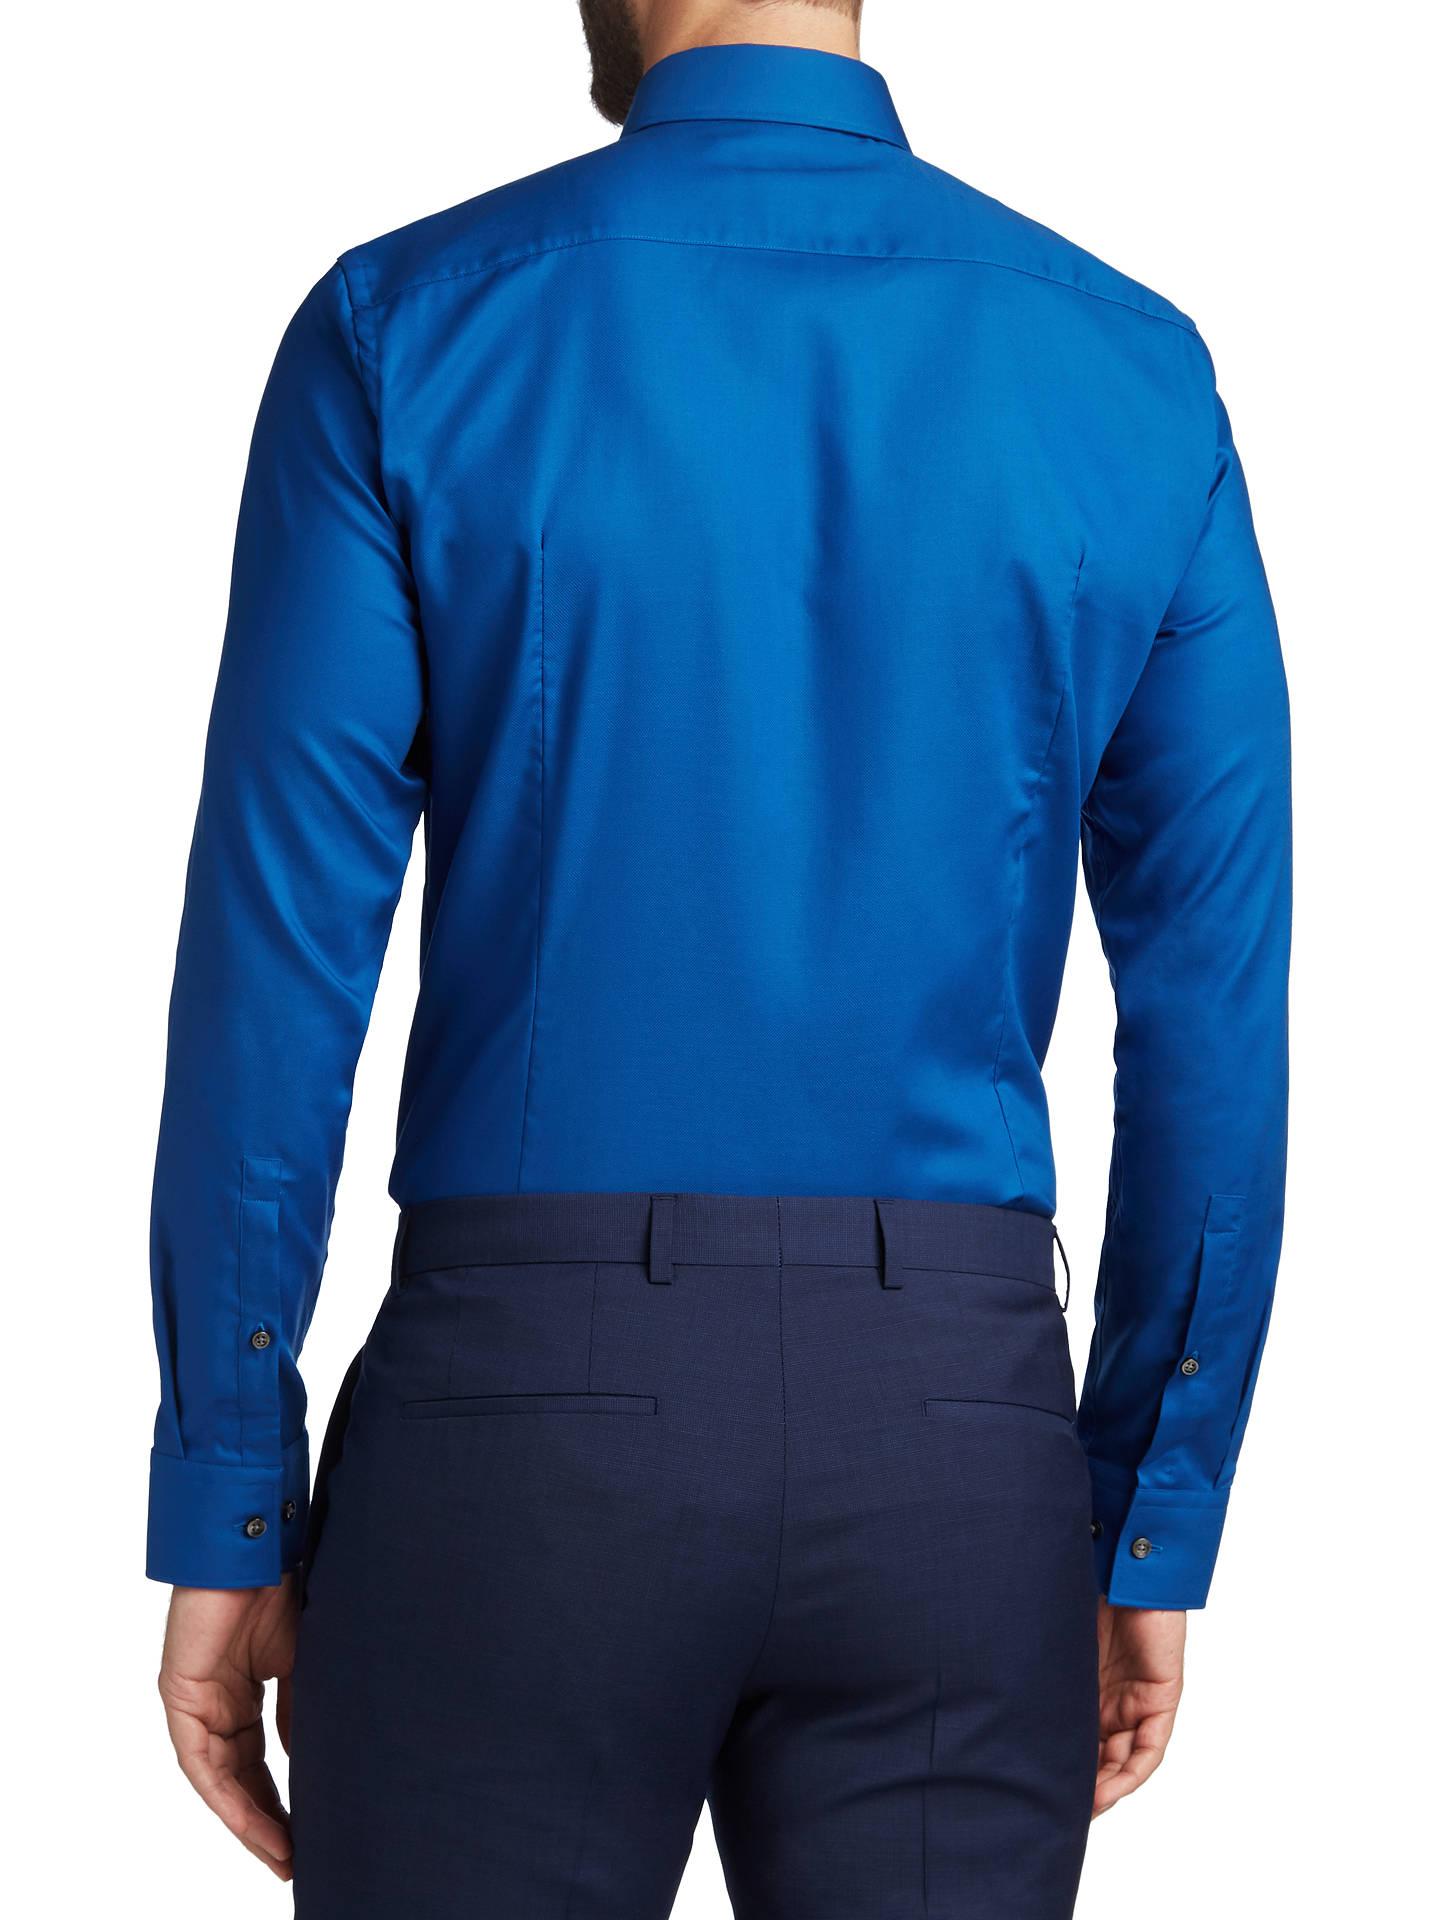 b2ca3232 ... Buy HUGO by Hugo Boss C-Jason Easy Iron Cotton Slim Fit Shirt, Open ...